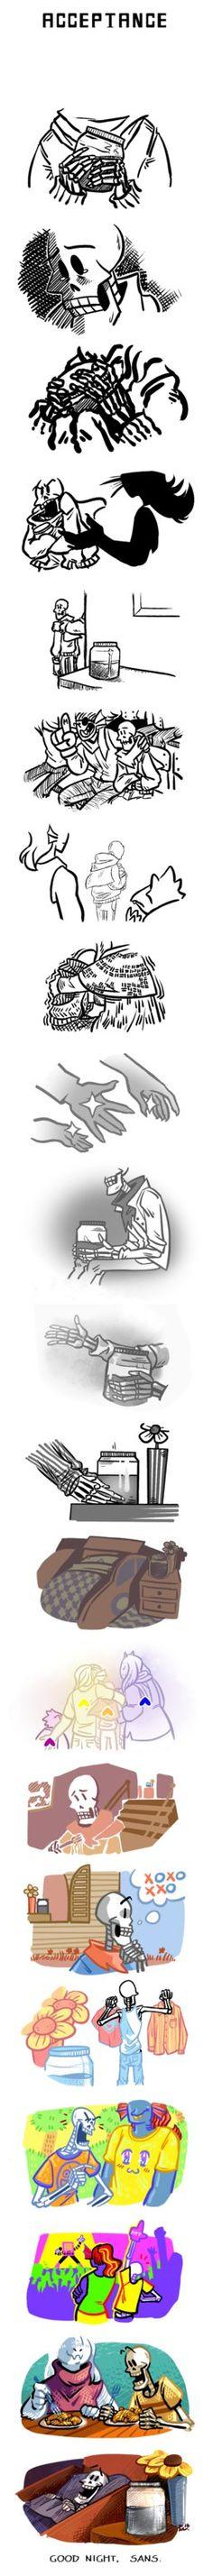 Acceptance (a zarla-inspired recovery comic) by JimPAVLICA on DeviantArt Undertale Memes, Undertale Fanart, Undertale Comic, Sans Puns, Flowey The Flower, Sad Comics, Toby Fox, Underswap, Indie Games